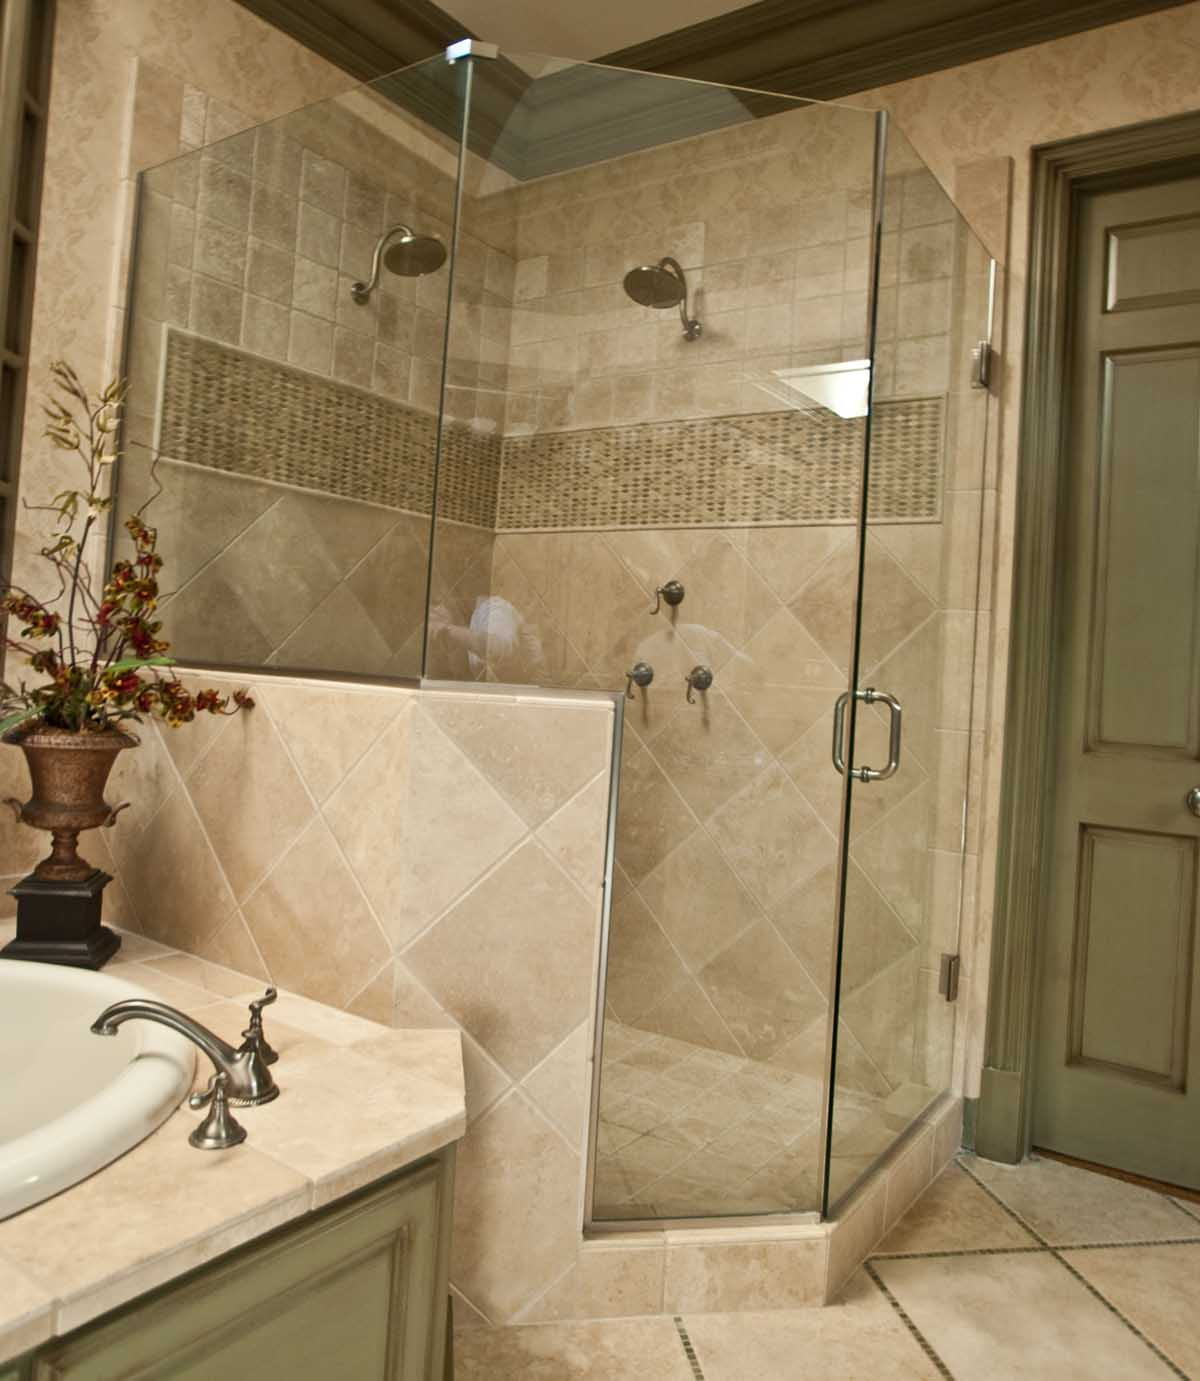 rustic-bathroom-ideas-beige-ceramic-stone-lowes-bathroom-tile-double-handle-stainless-steel-bathroom-faucet-dark-green-painted-wooden-bathroom-door-floral-canvas-painting-walls-decor